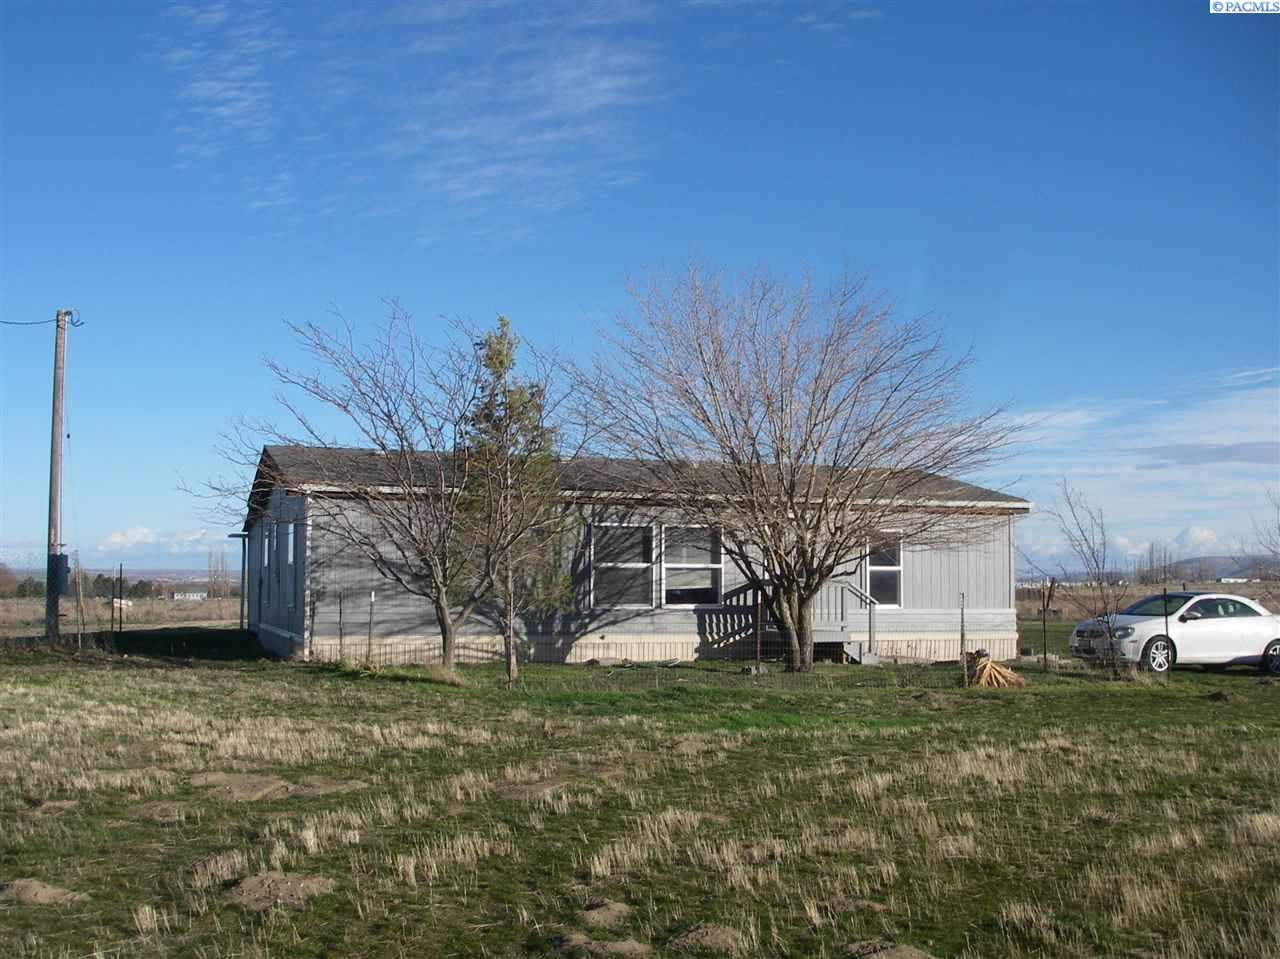 Single Family Home for Sale at 50105 S Carrol Prse 50105 S Carrol Prse Finley, Washington 99337 United States